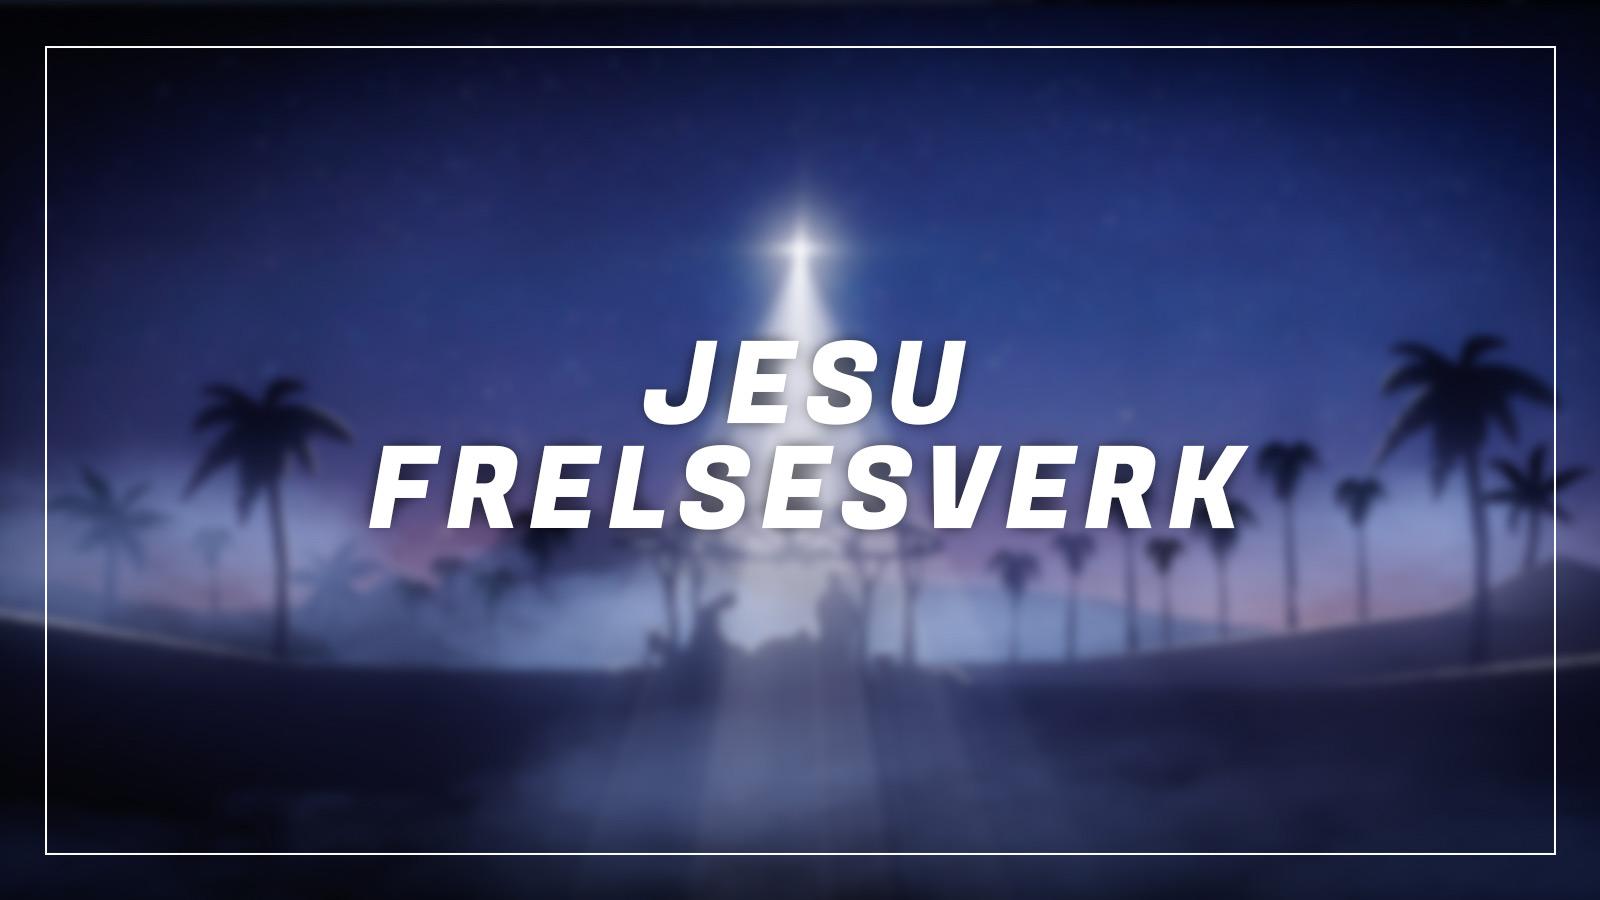 Jesu Frelsesverk